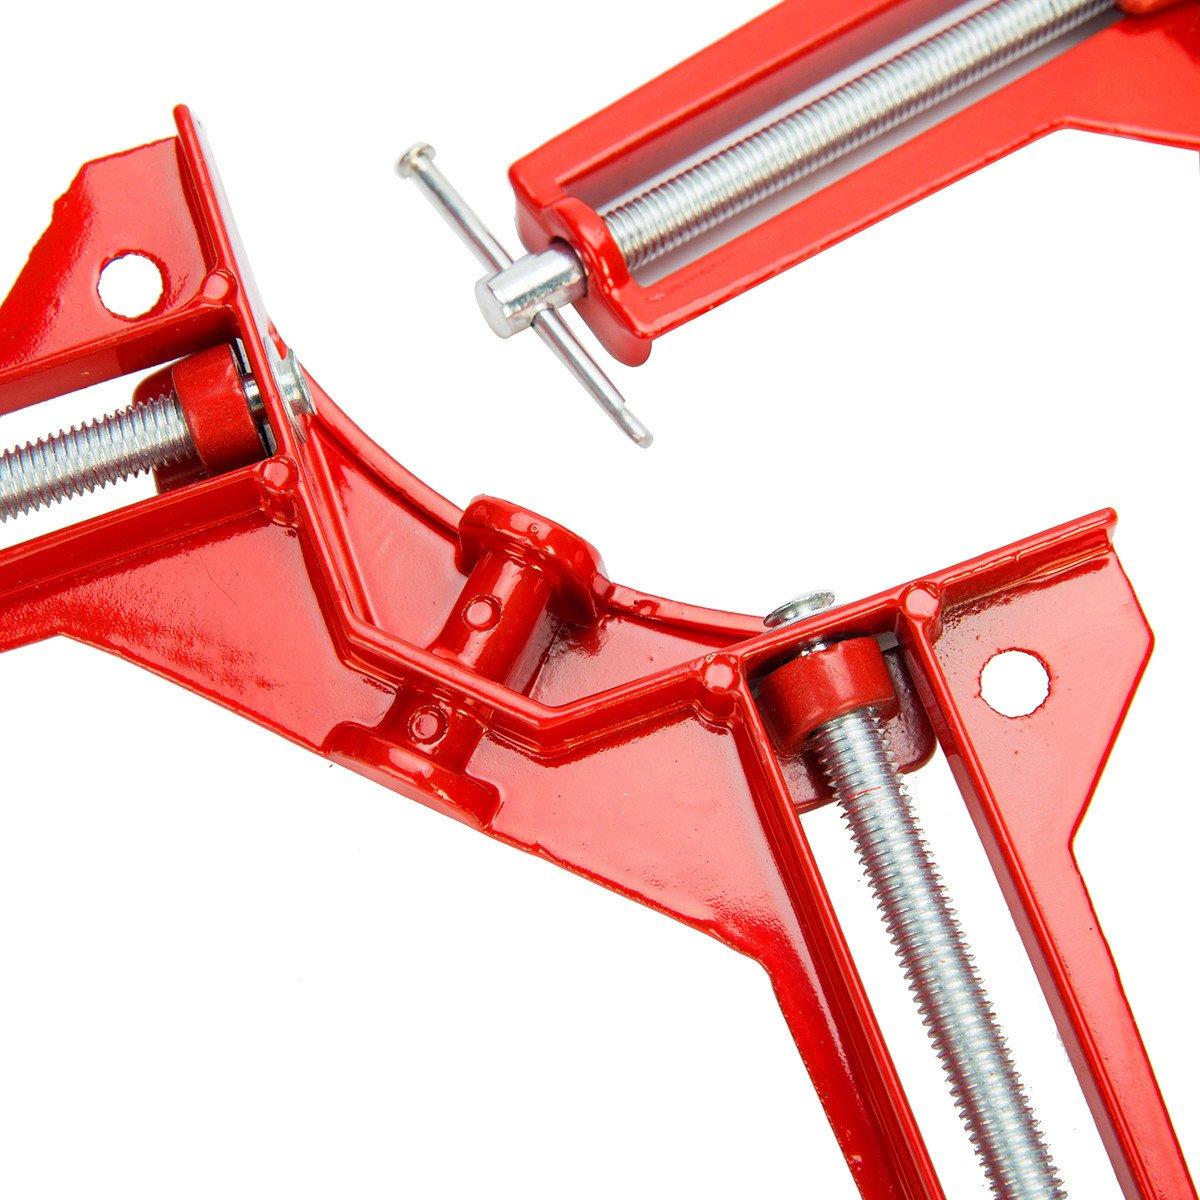 /4/pieza HSM ingletadora Sargento tensor de /ángulo de 75/mm esquina 20115/Sargento apriete FreeTec/ /ángulo 20115